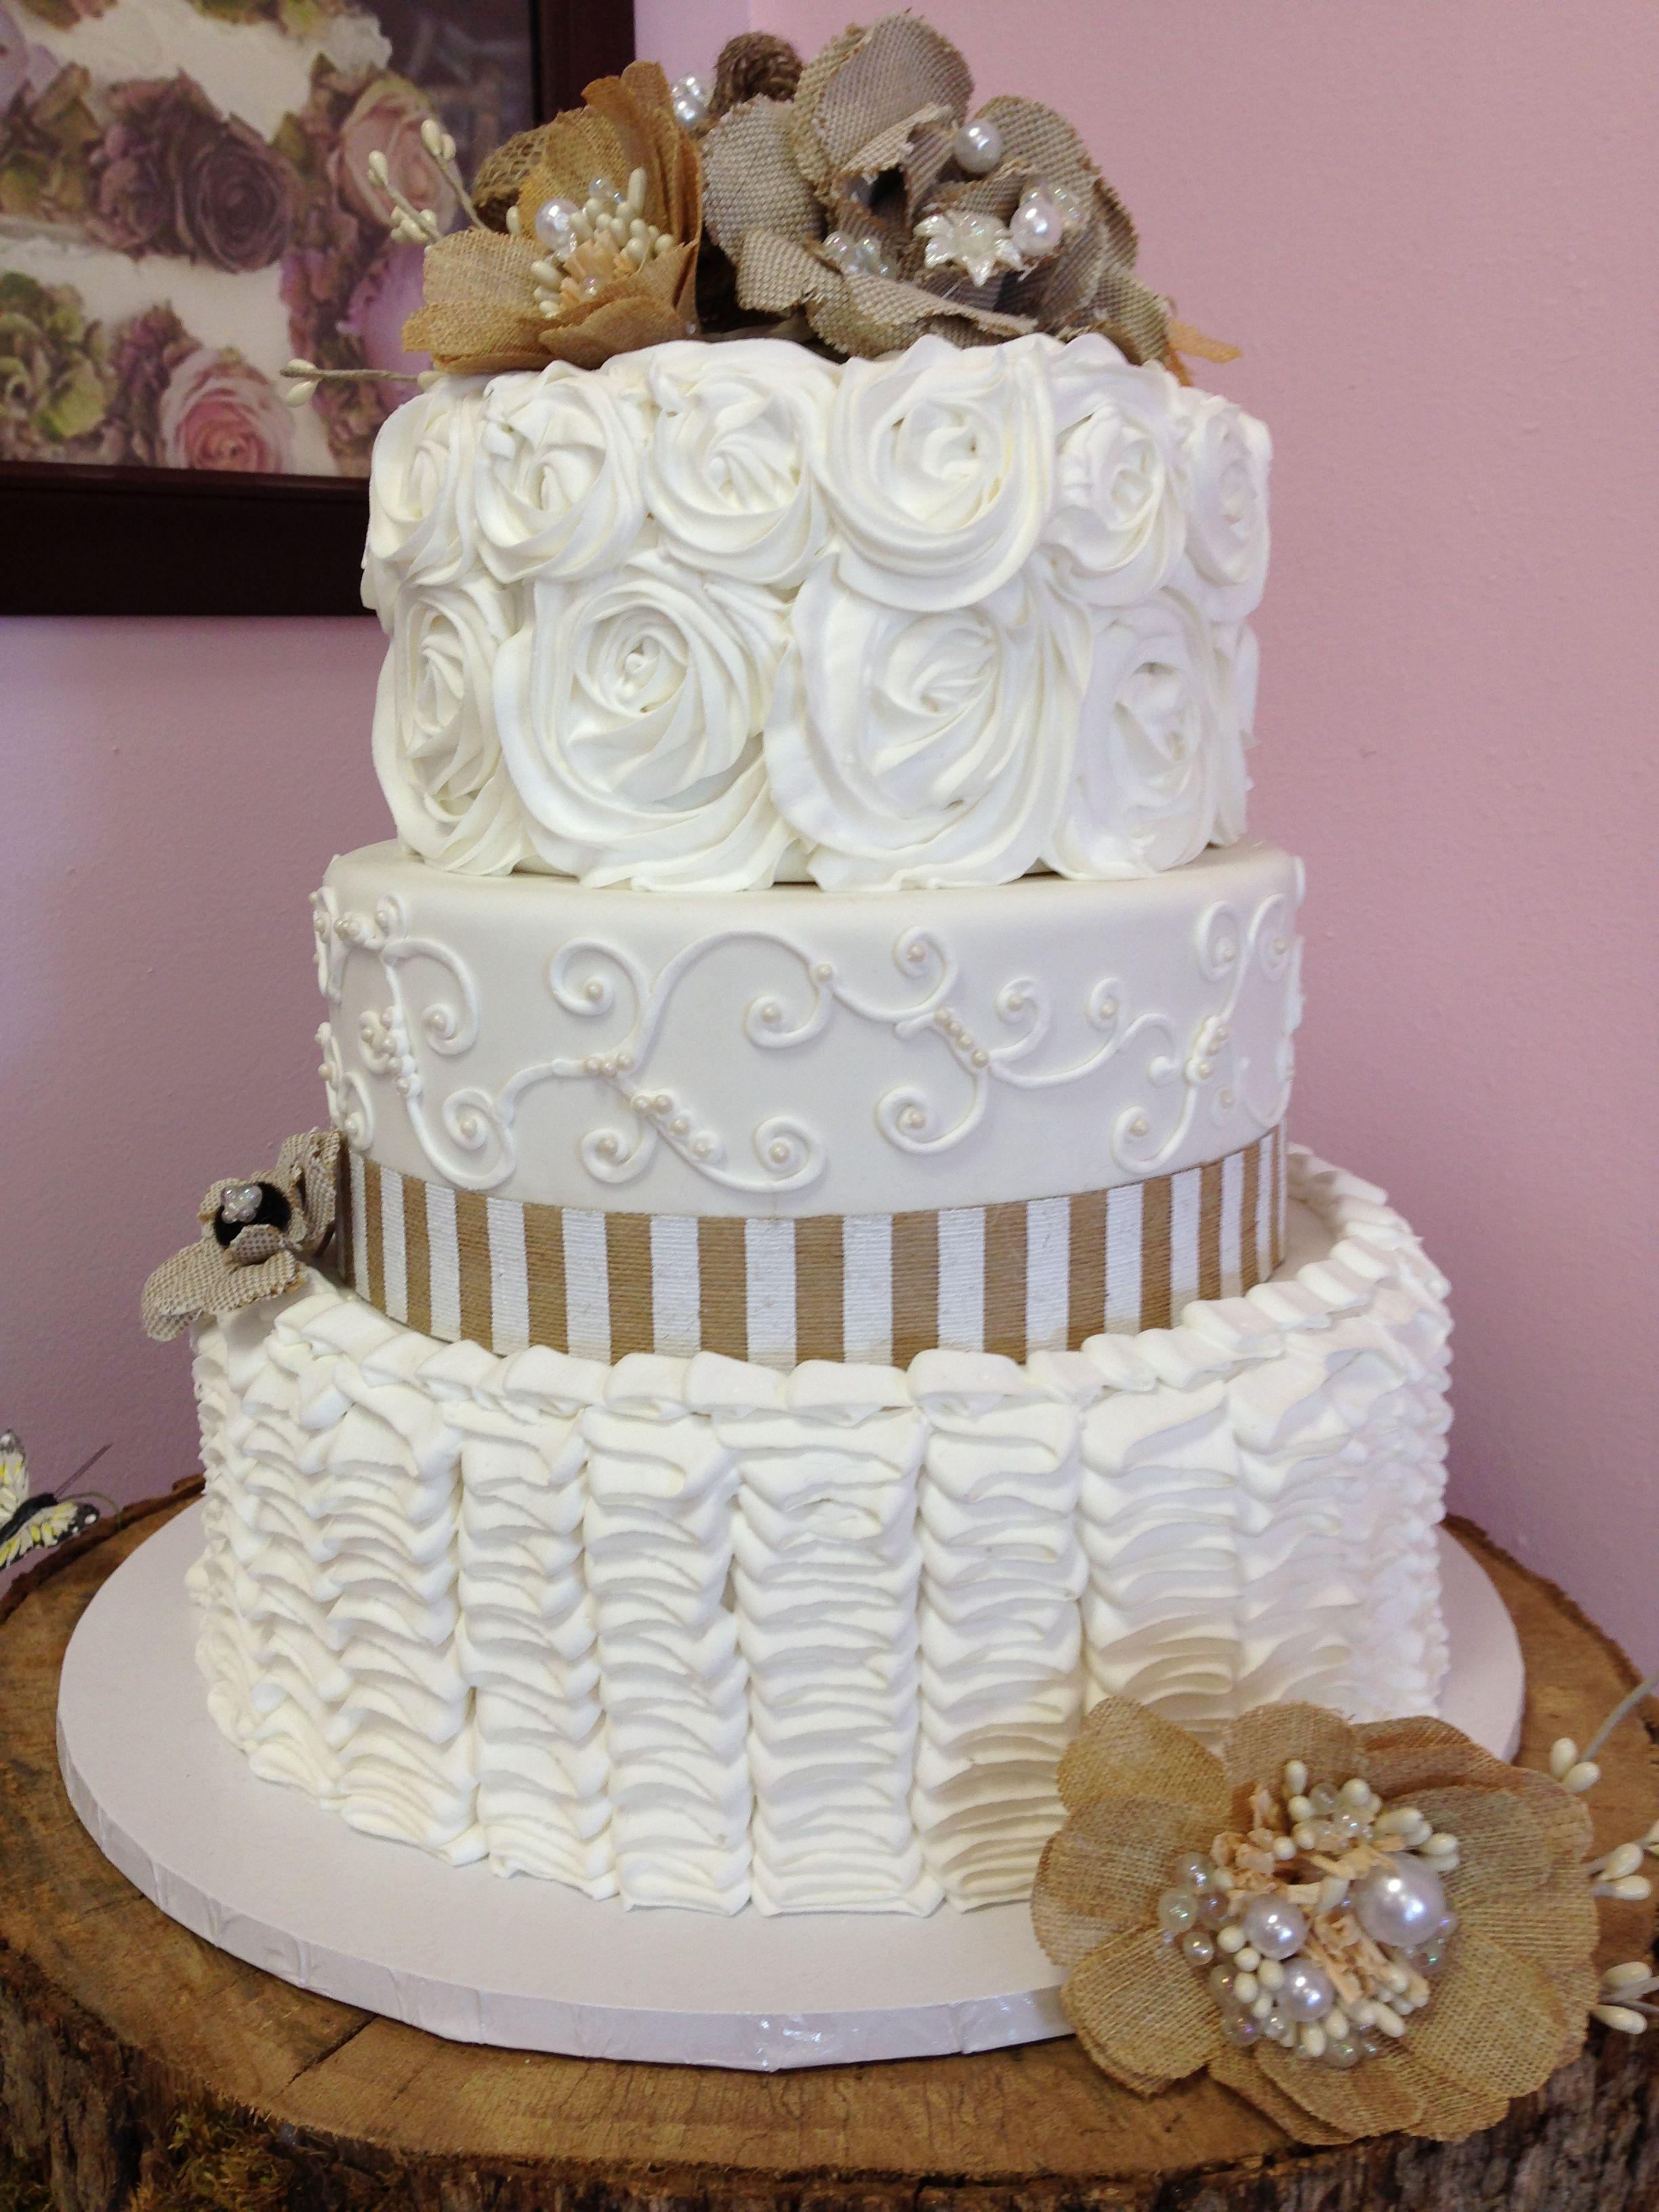 Pin Rustic Burlap Wedding Cake Servers And Guest